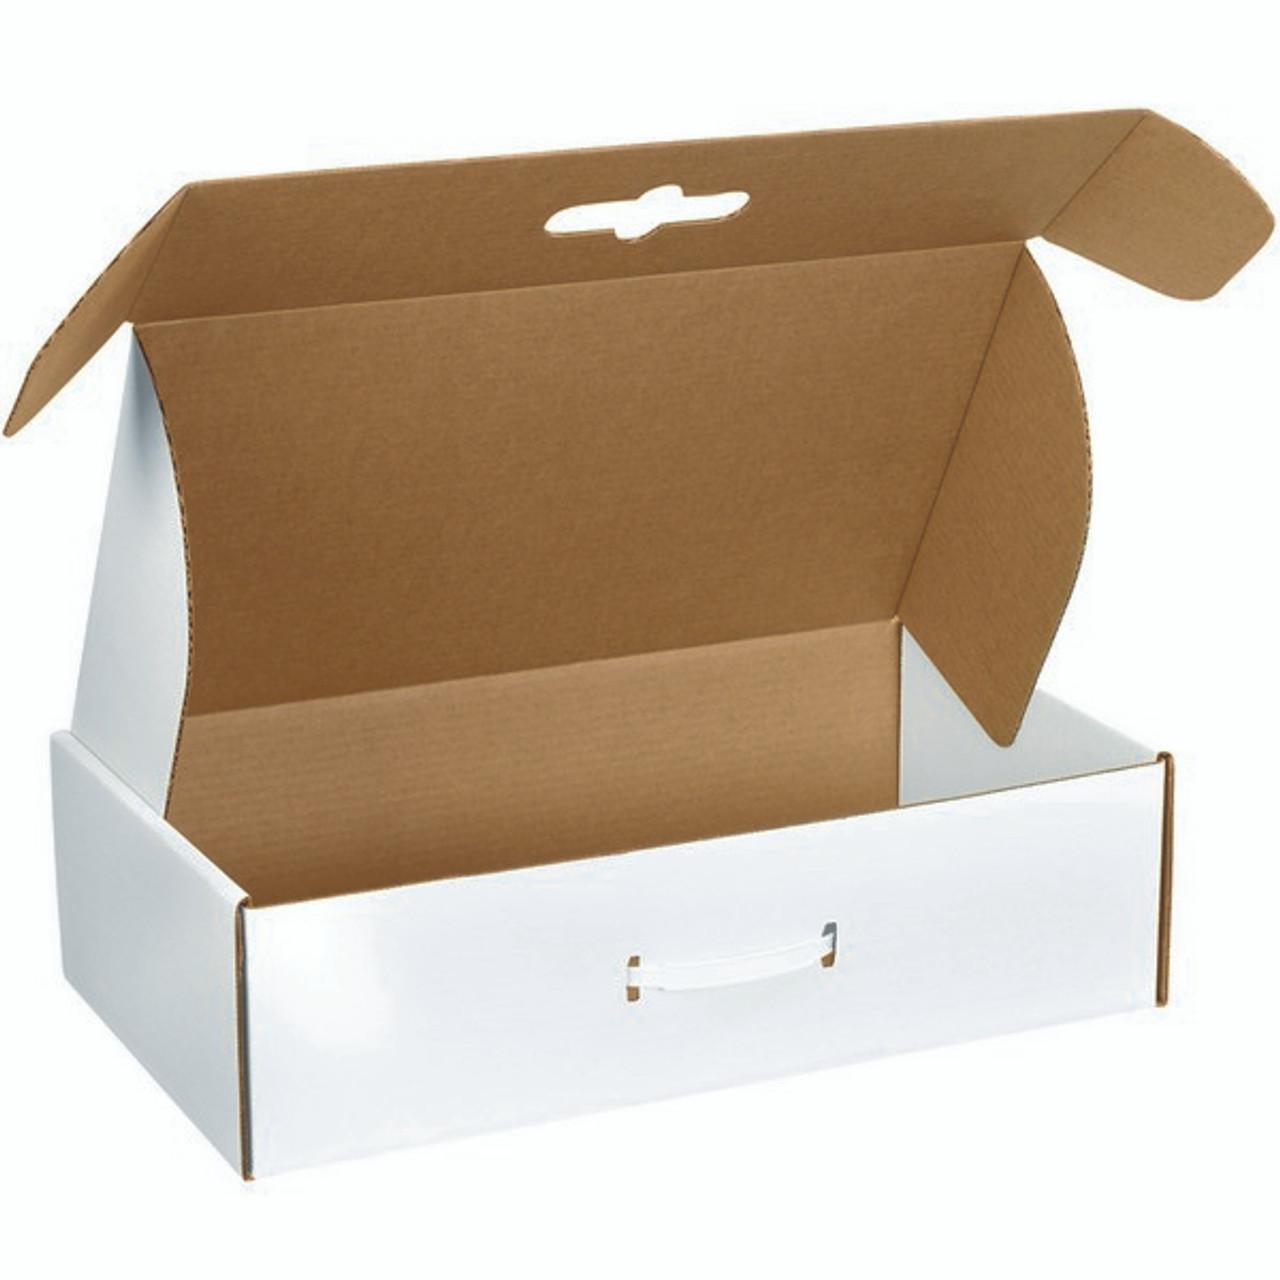 Cardboard Carrying Case : corrugated cardboard carrying case bulk berlin packaging ~ Russianpoet.info Haus und Dekorationen